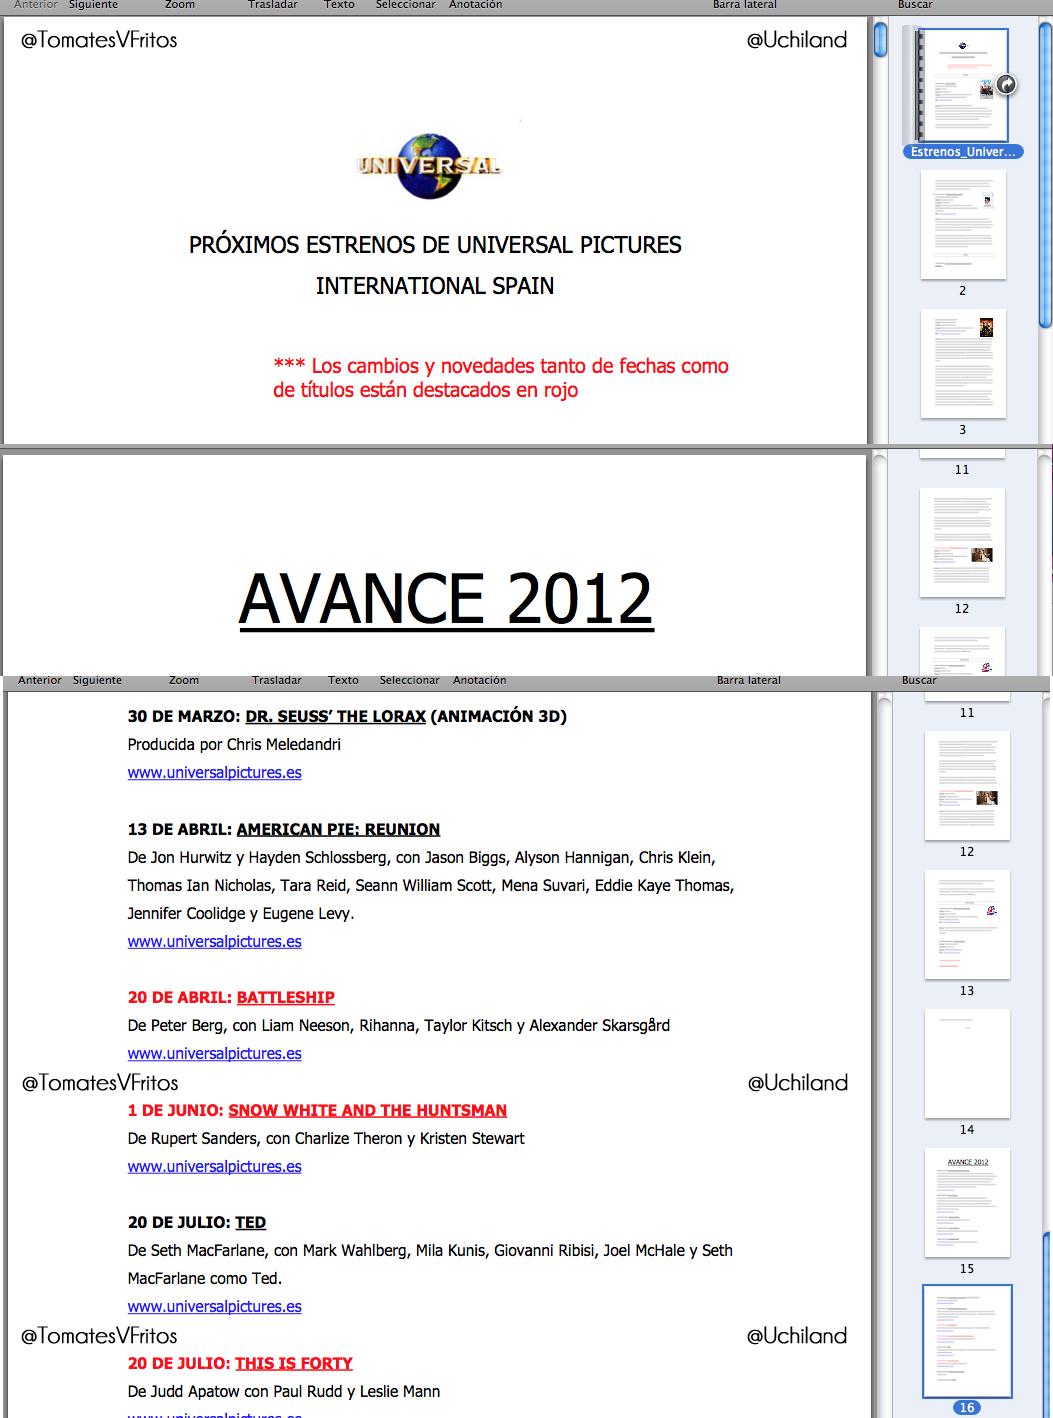 [Kristen Stewart] Blanche Neige (Snow White and the Huntsman) - Page 5 XJeAc